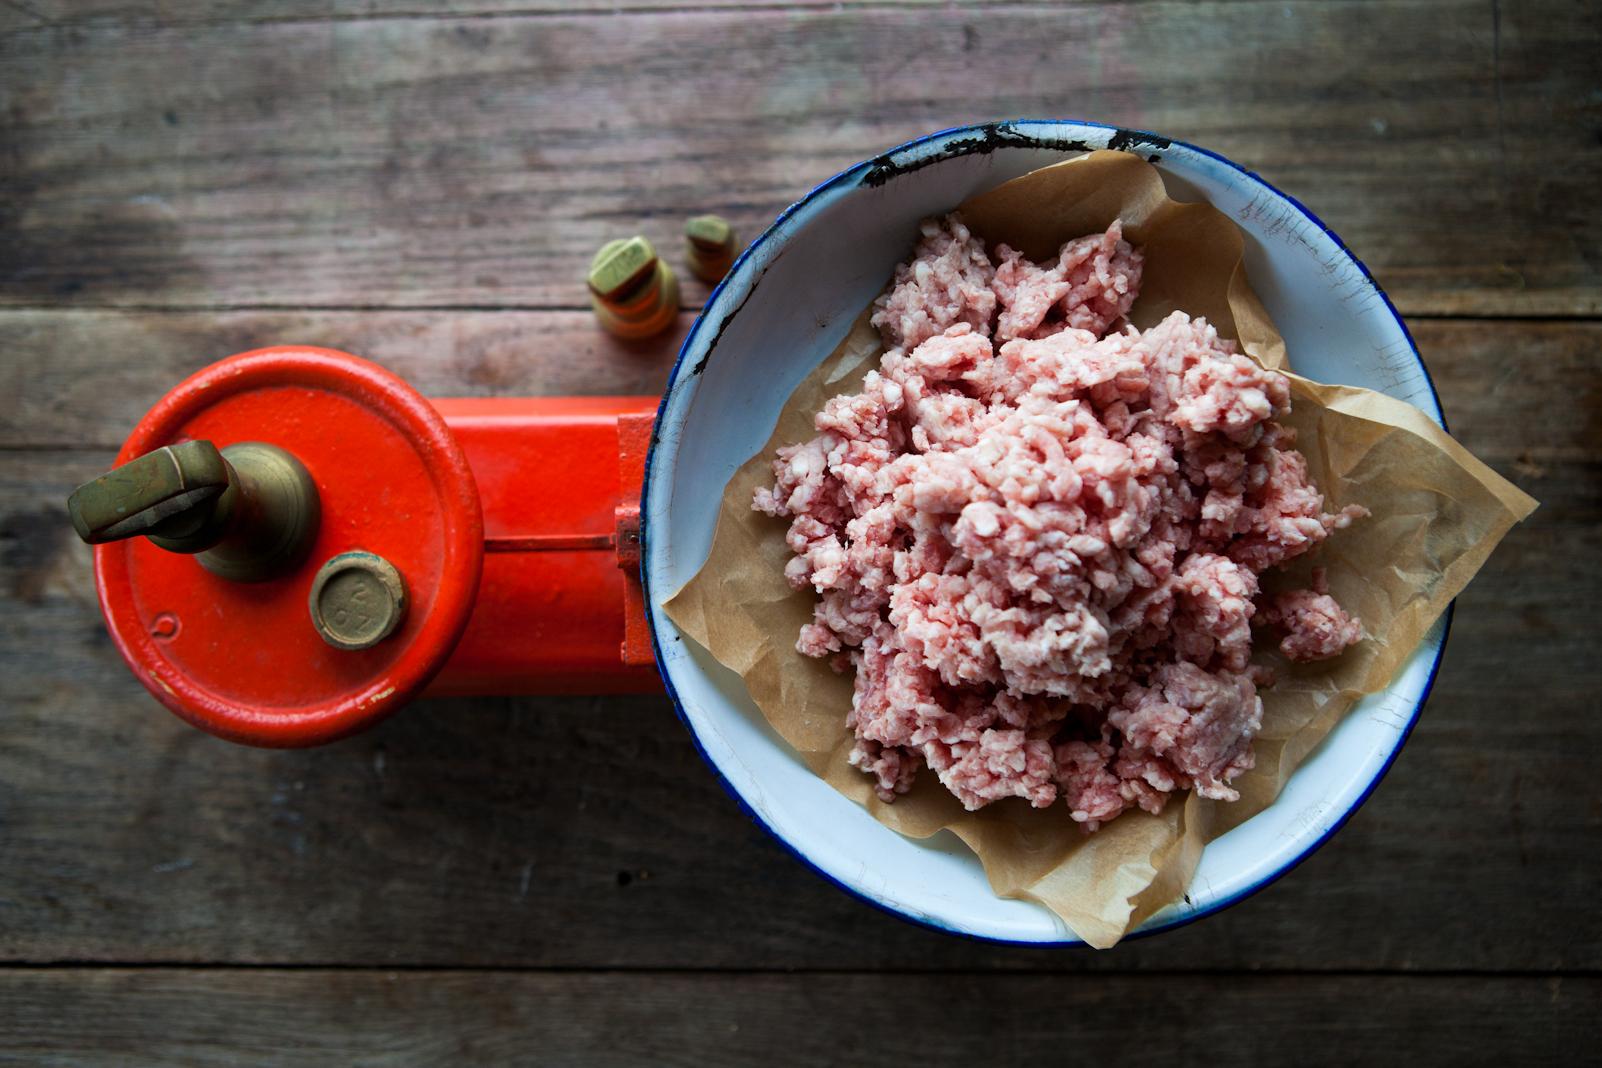 Raw Produce | Food Photography | Carlisle, Cumbria